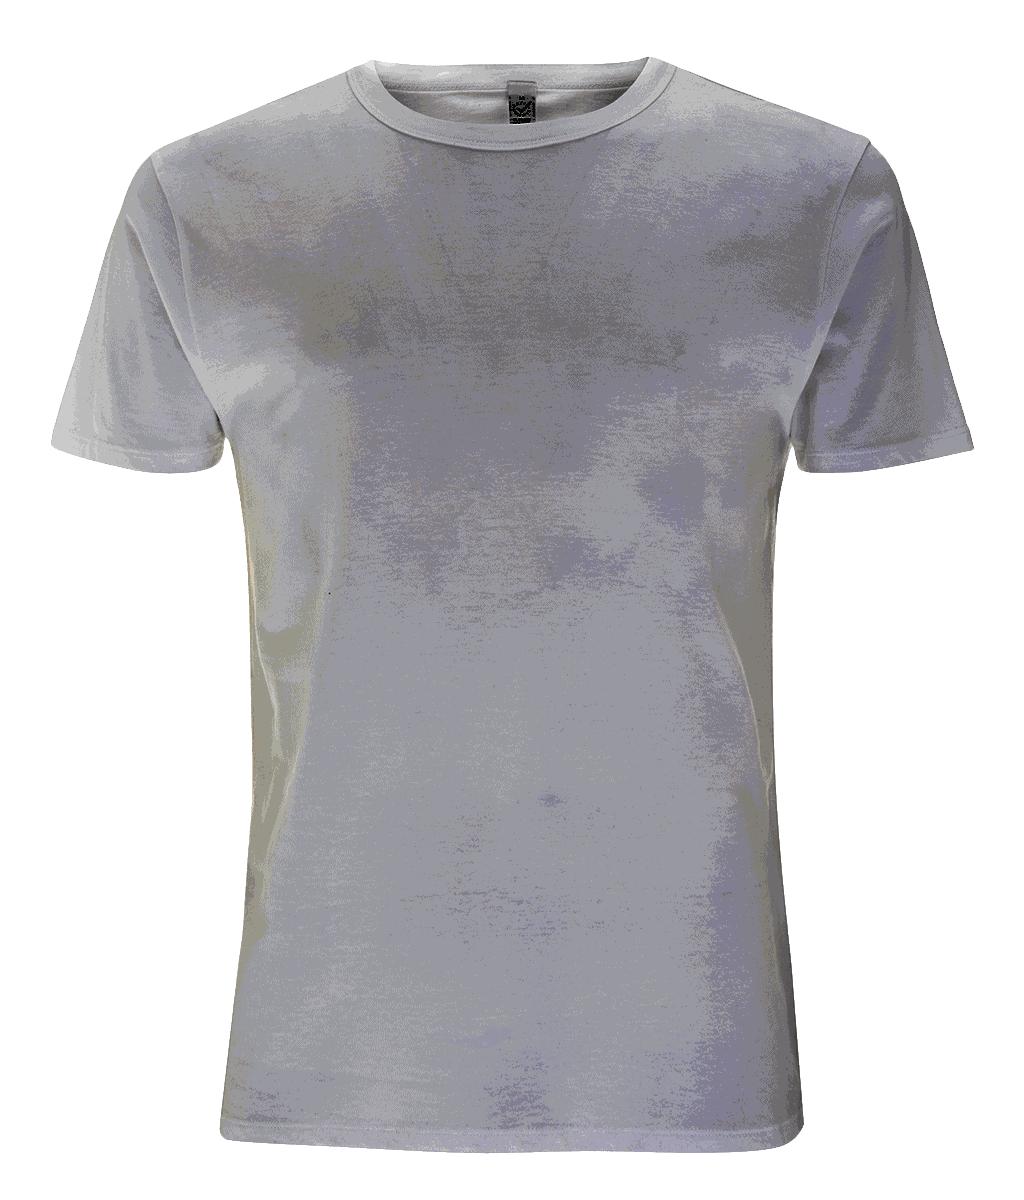 Blank Tencel Tshirt for Val Sauvage